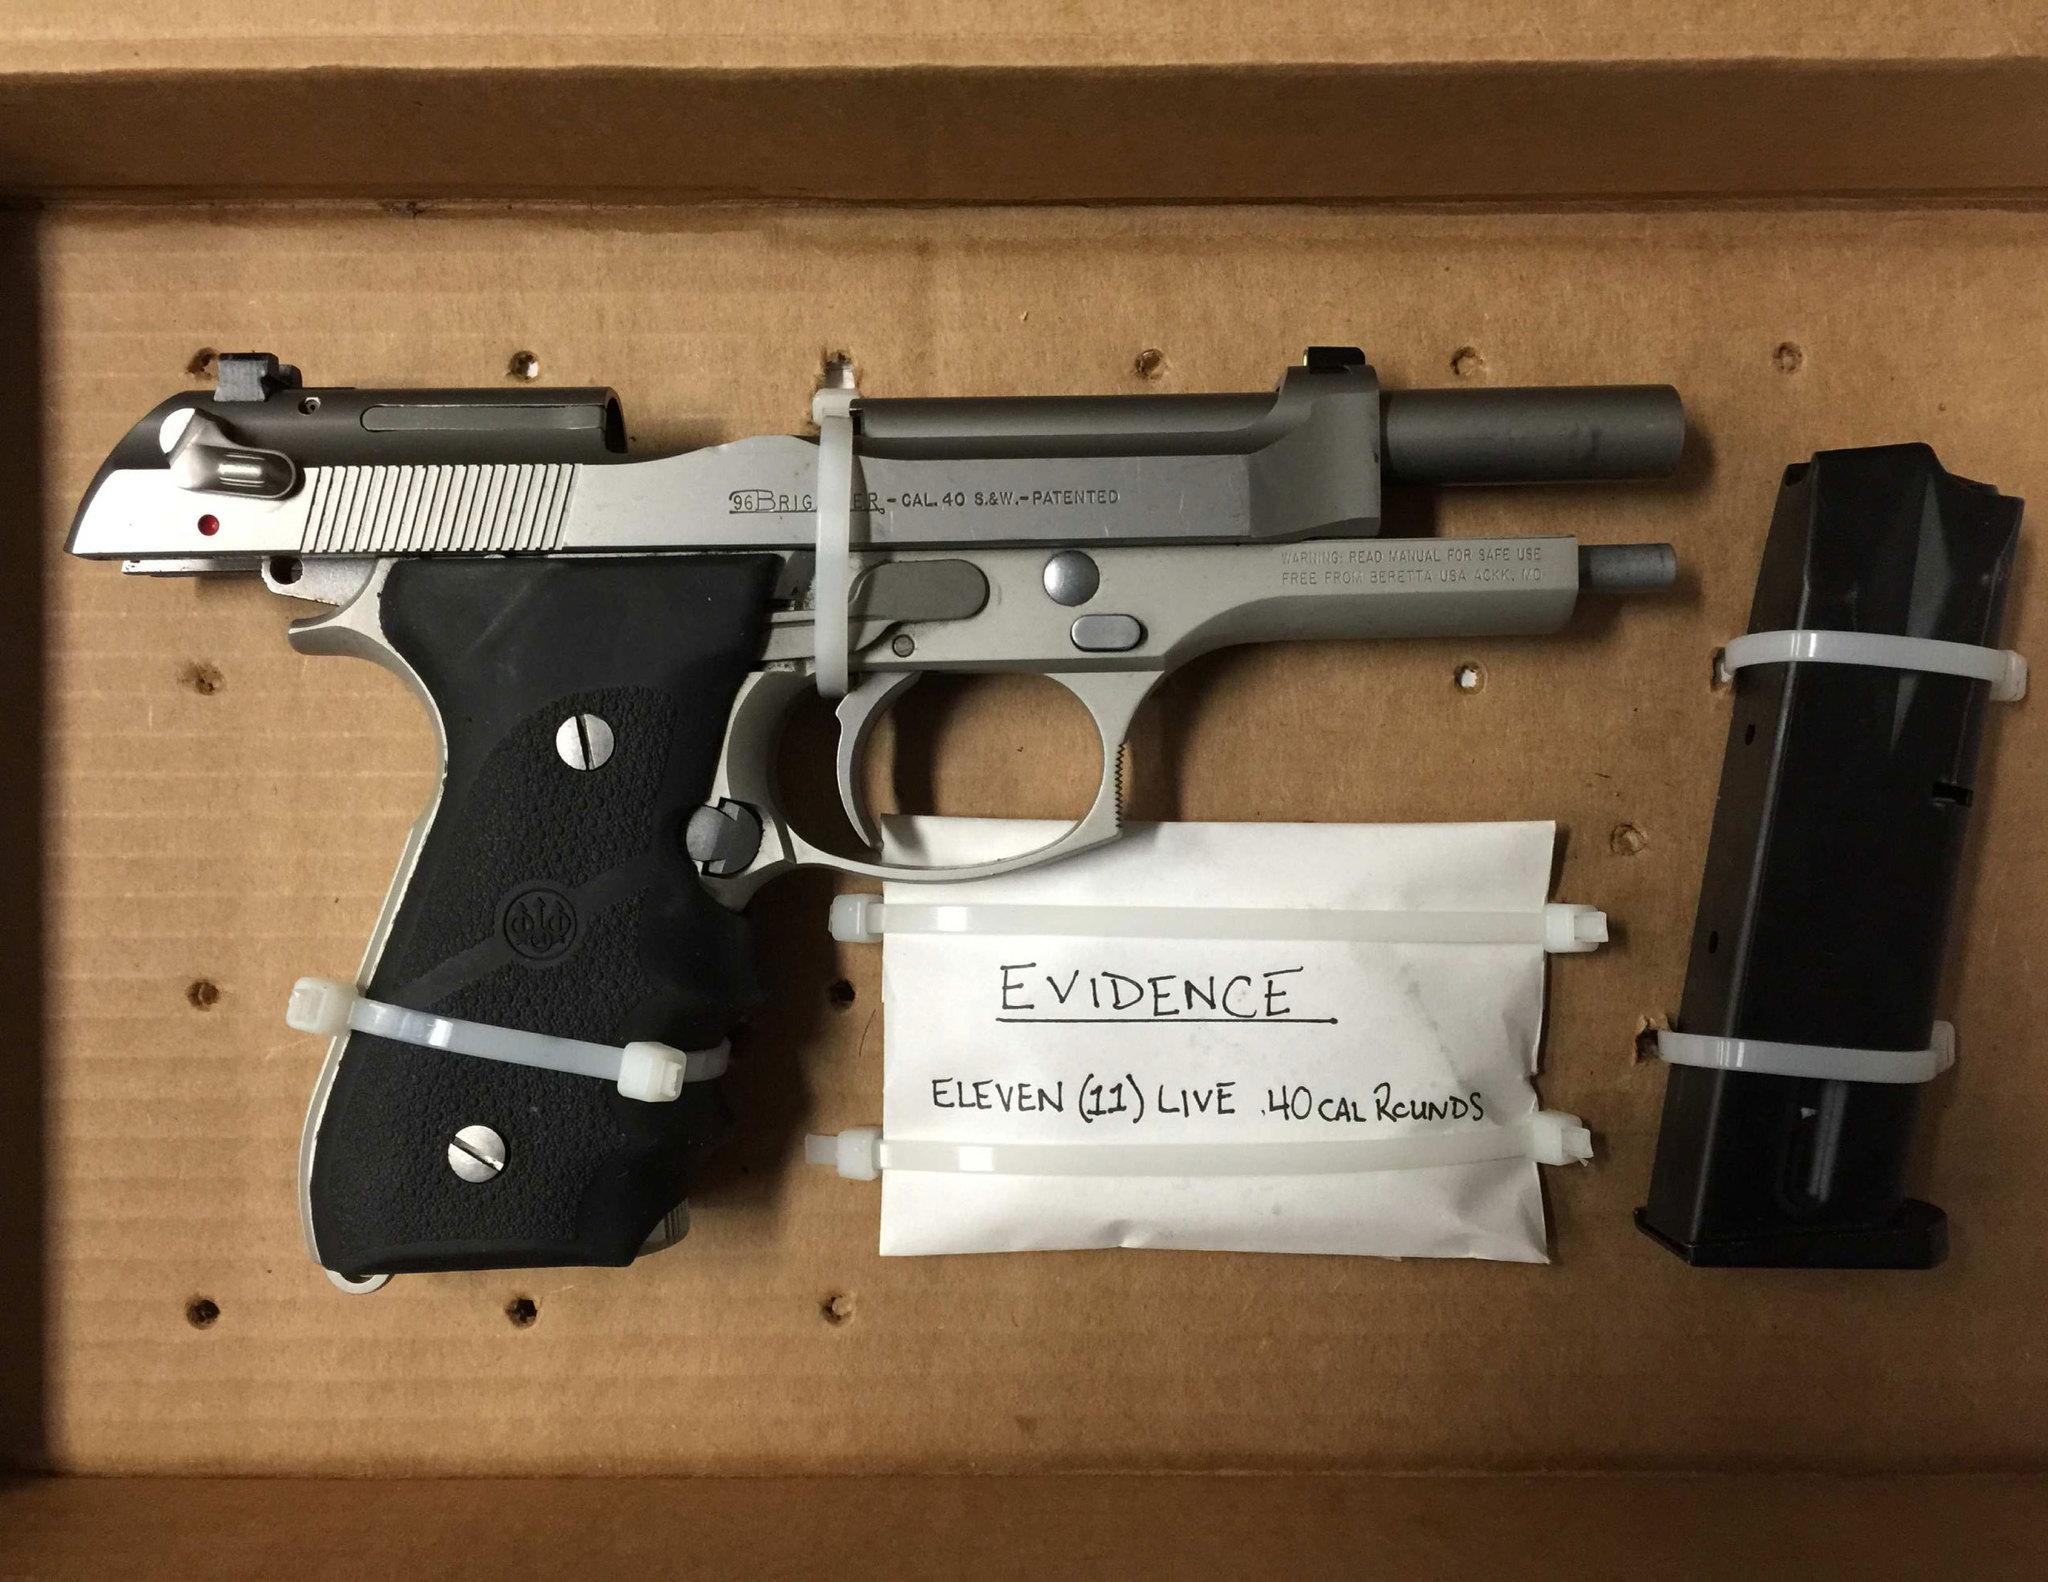 Hartford Police Seize Gun, Charge Three - Hartford Courant